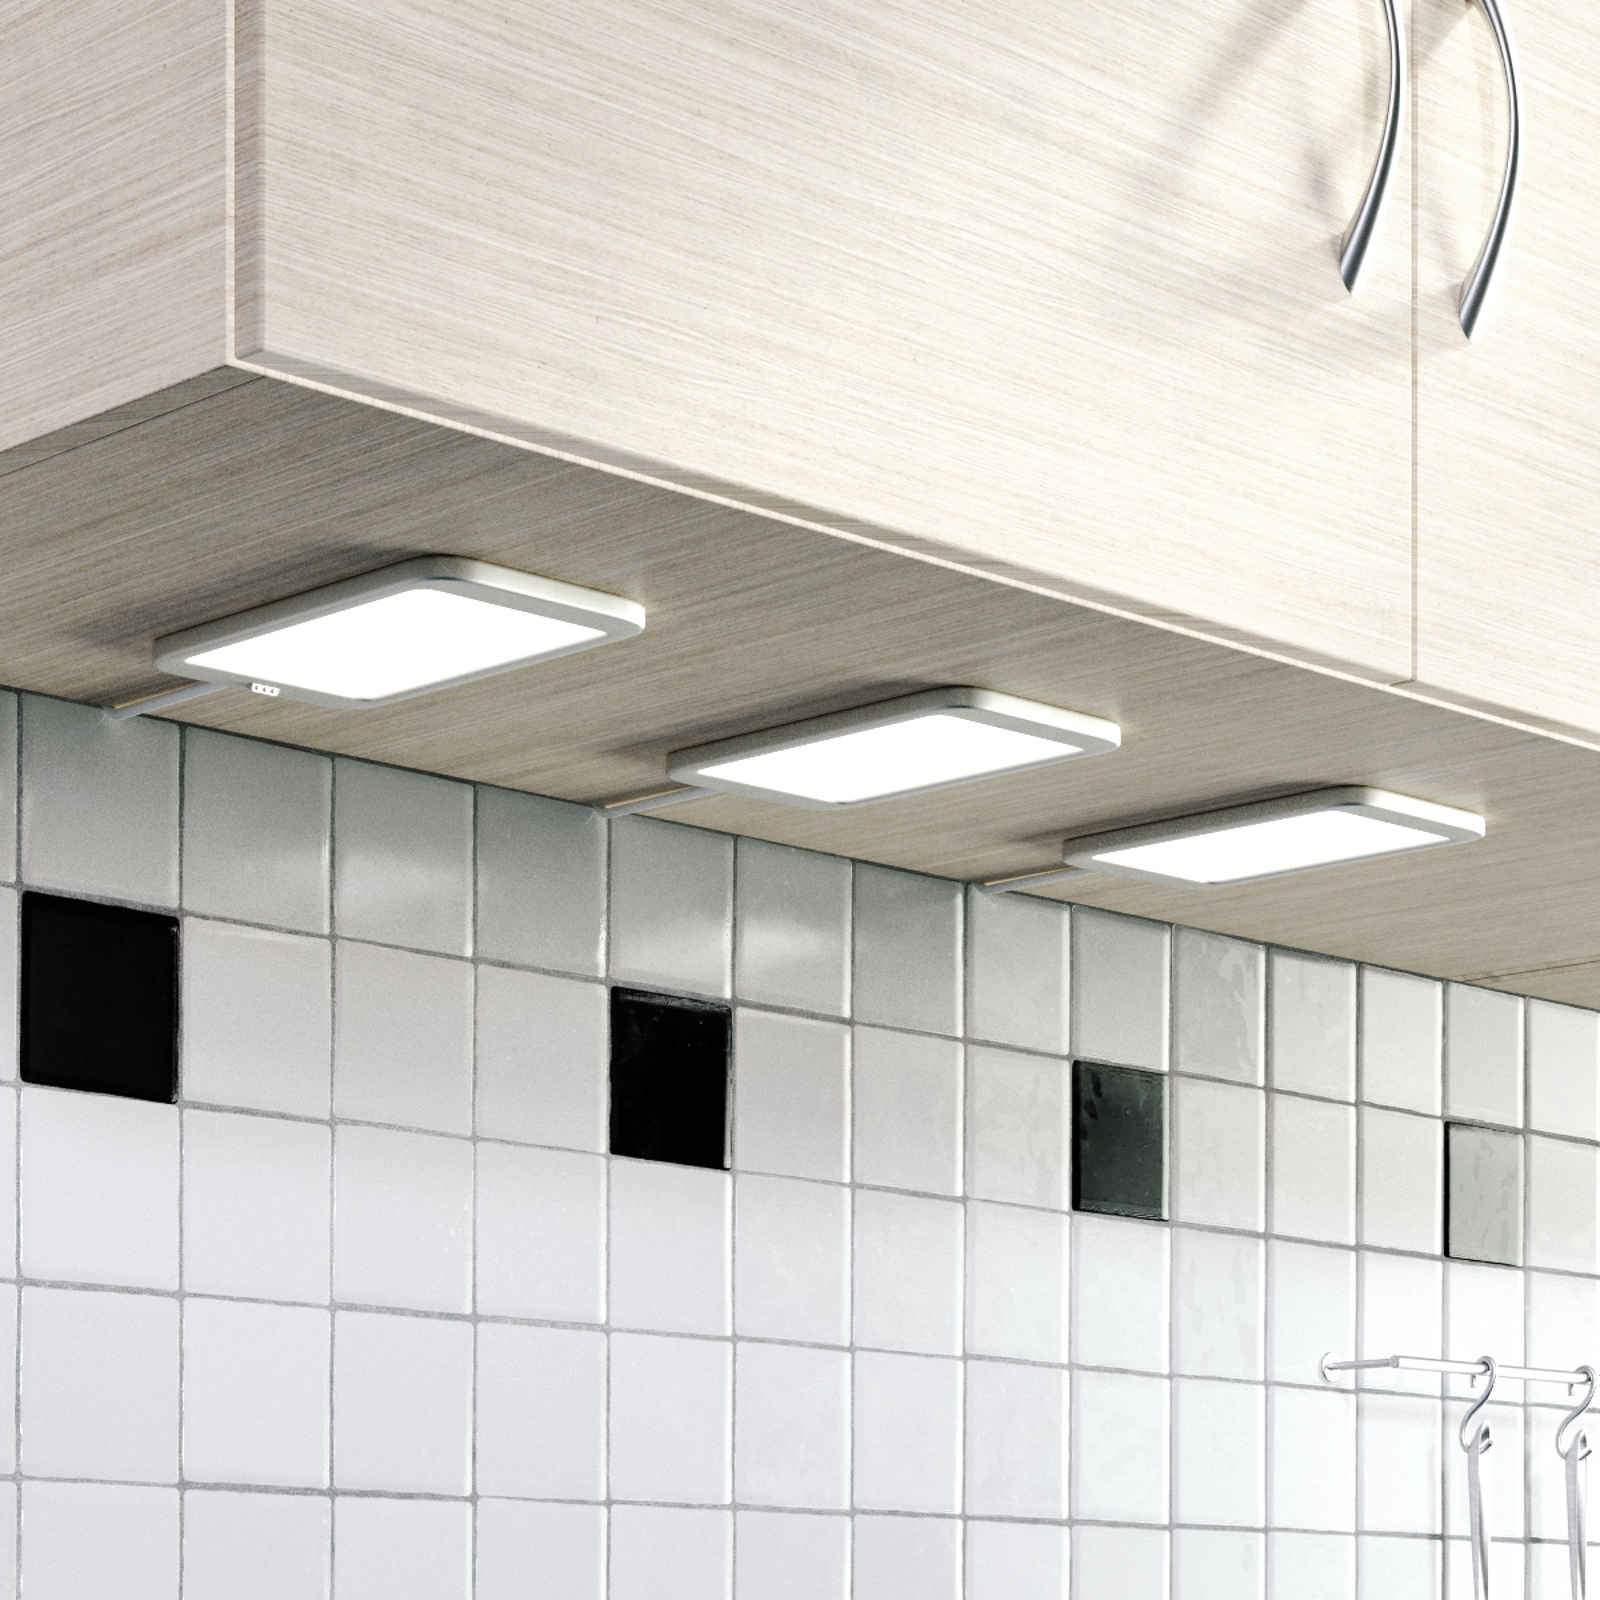 LED-kaapinalusvalaisin Svela, 3 kpl/sarja